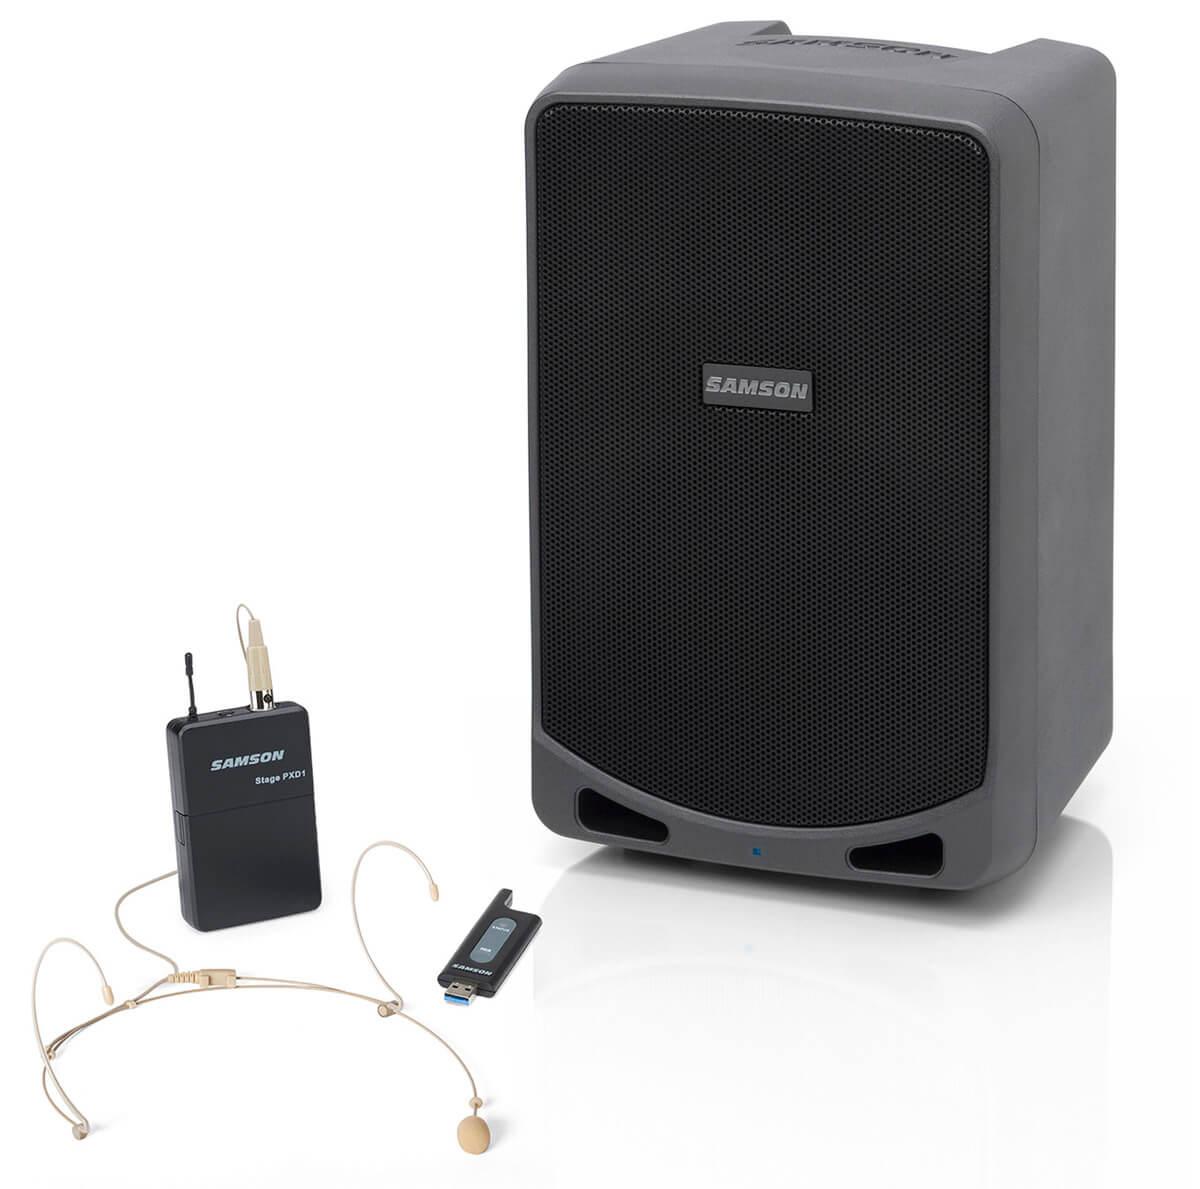 Samson XP106wDE transportabelt anlæg m/ headset-mikrofon